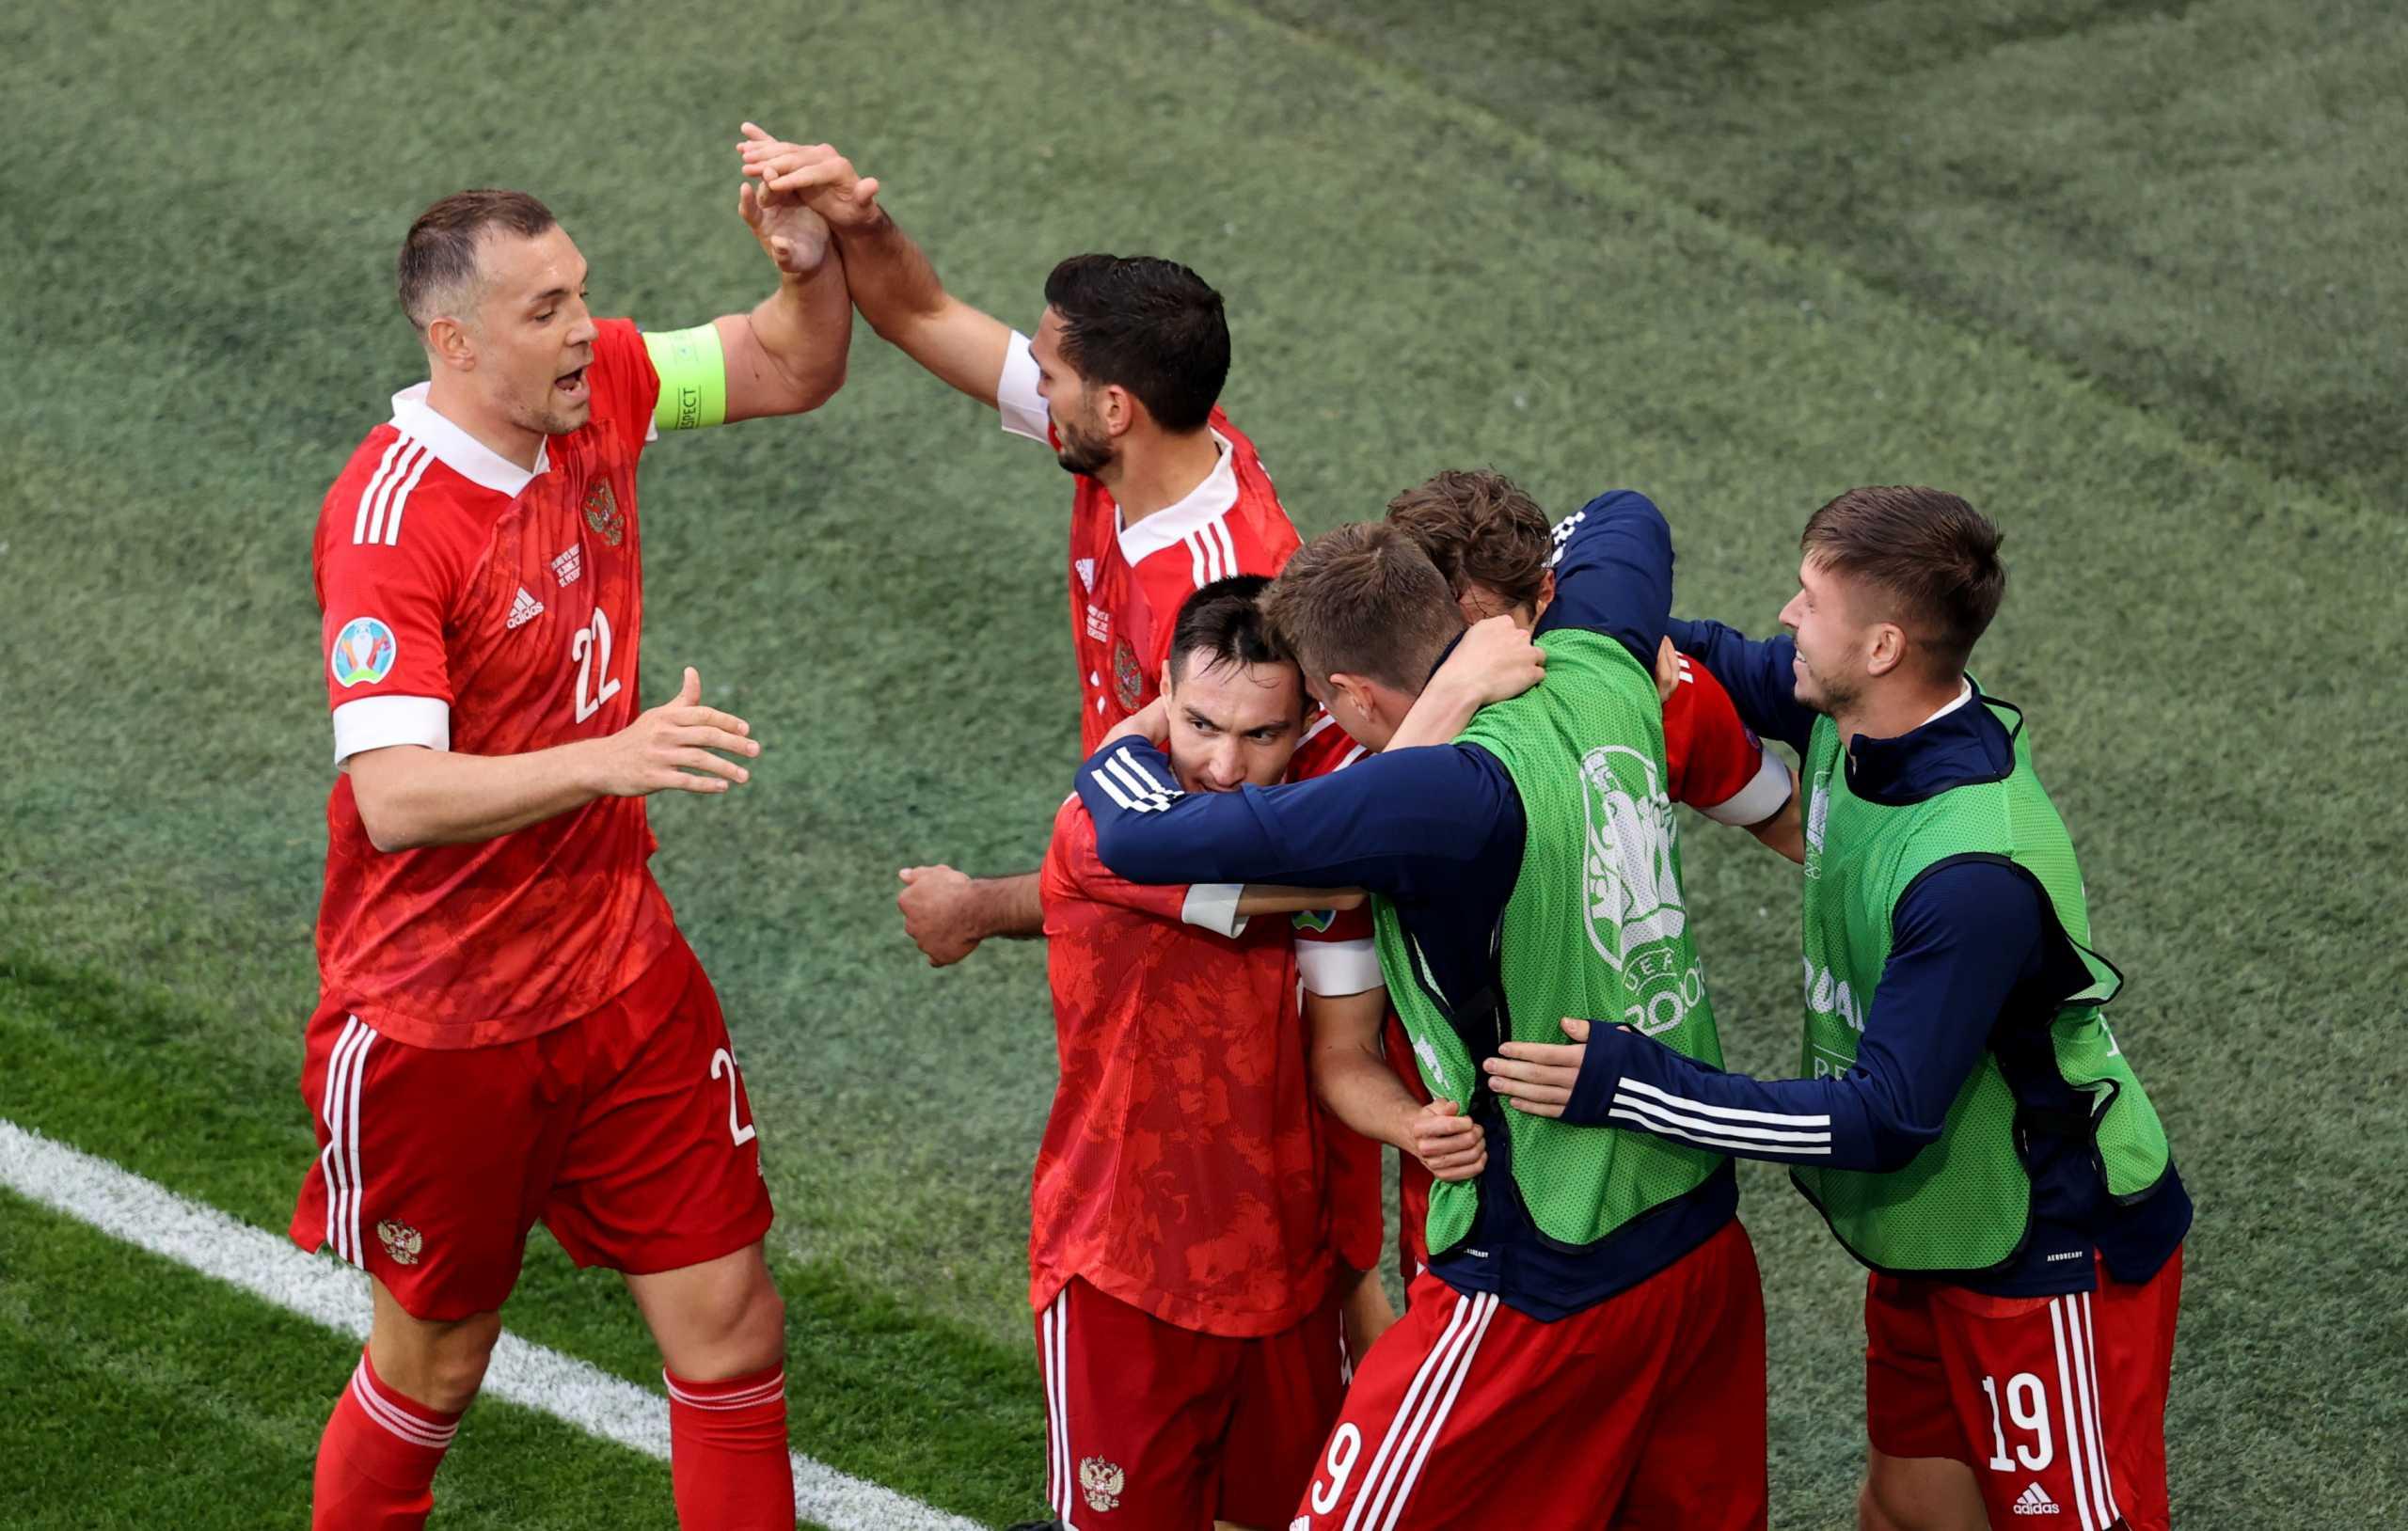 Euro 2020, Φινλανδία – Ρωσία 0-1: Με γκολάρα έβαλαν φωτιά στο όμιλο οι Ρώσοι